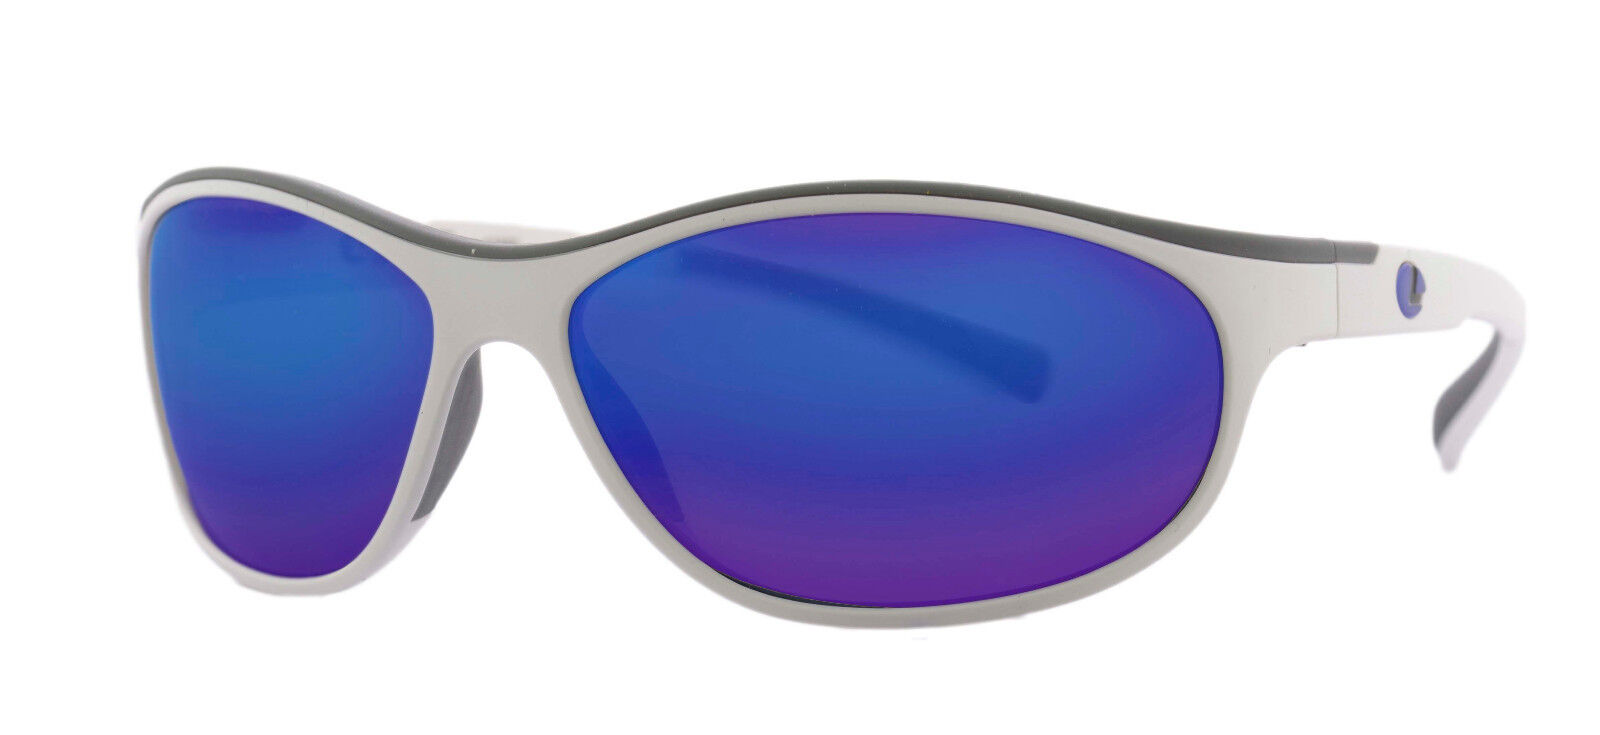 Lenz Optics Discover Coosa White Gunblueemirrorlens Polarized Glasses 53880